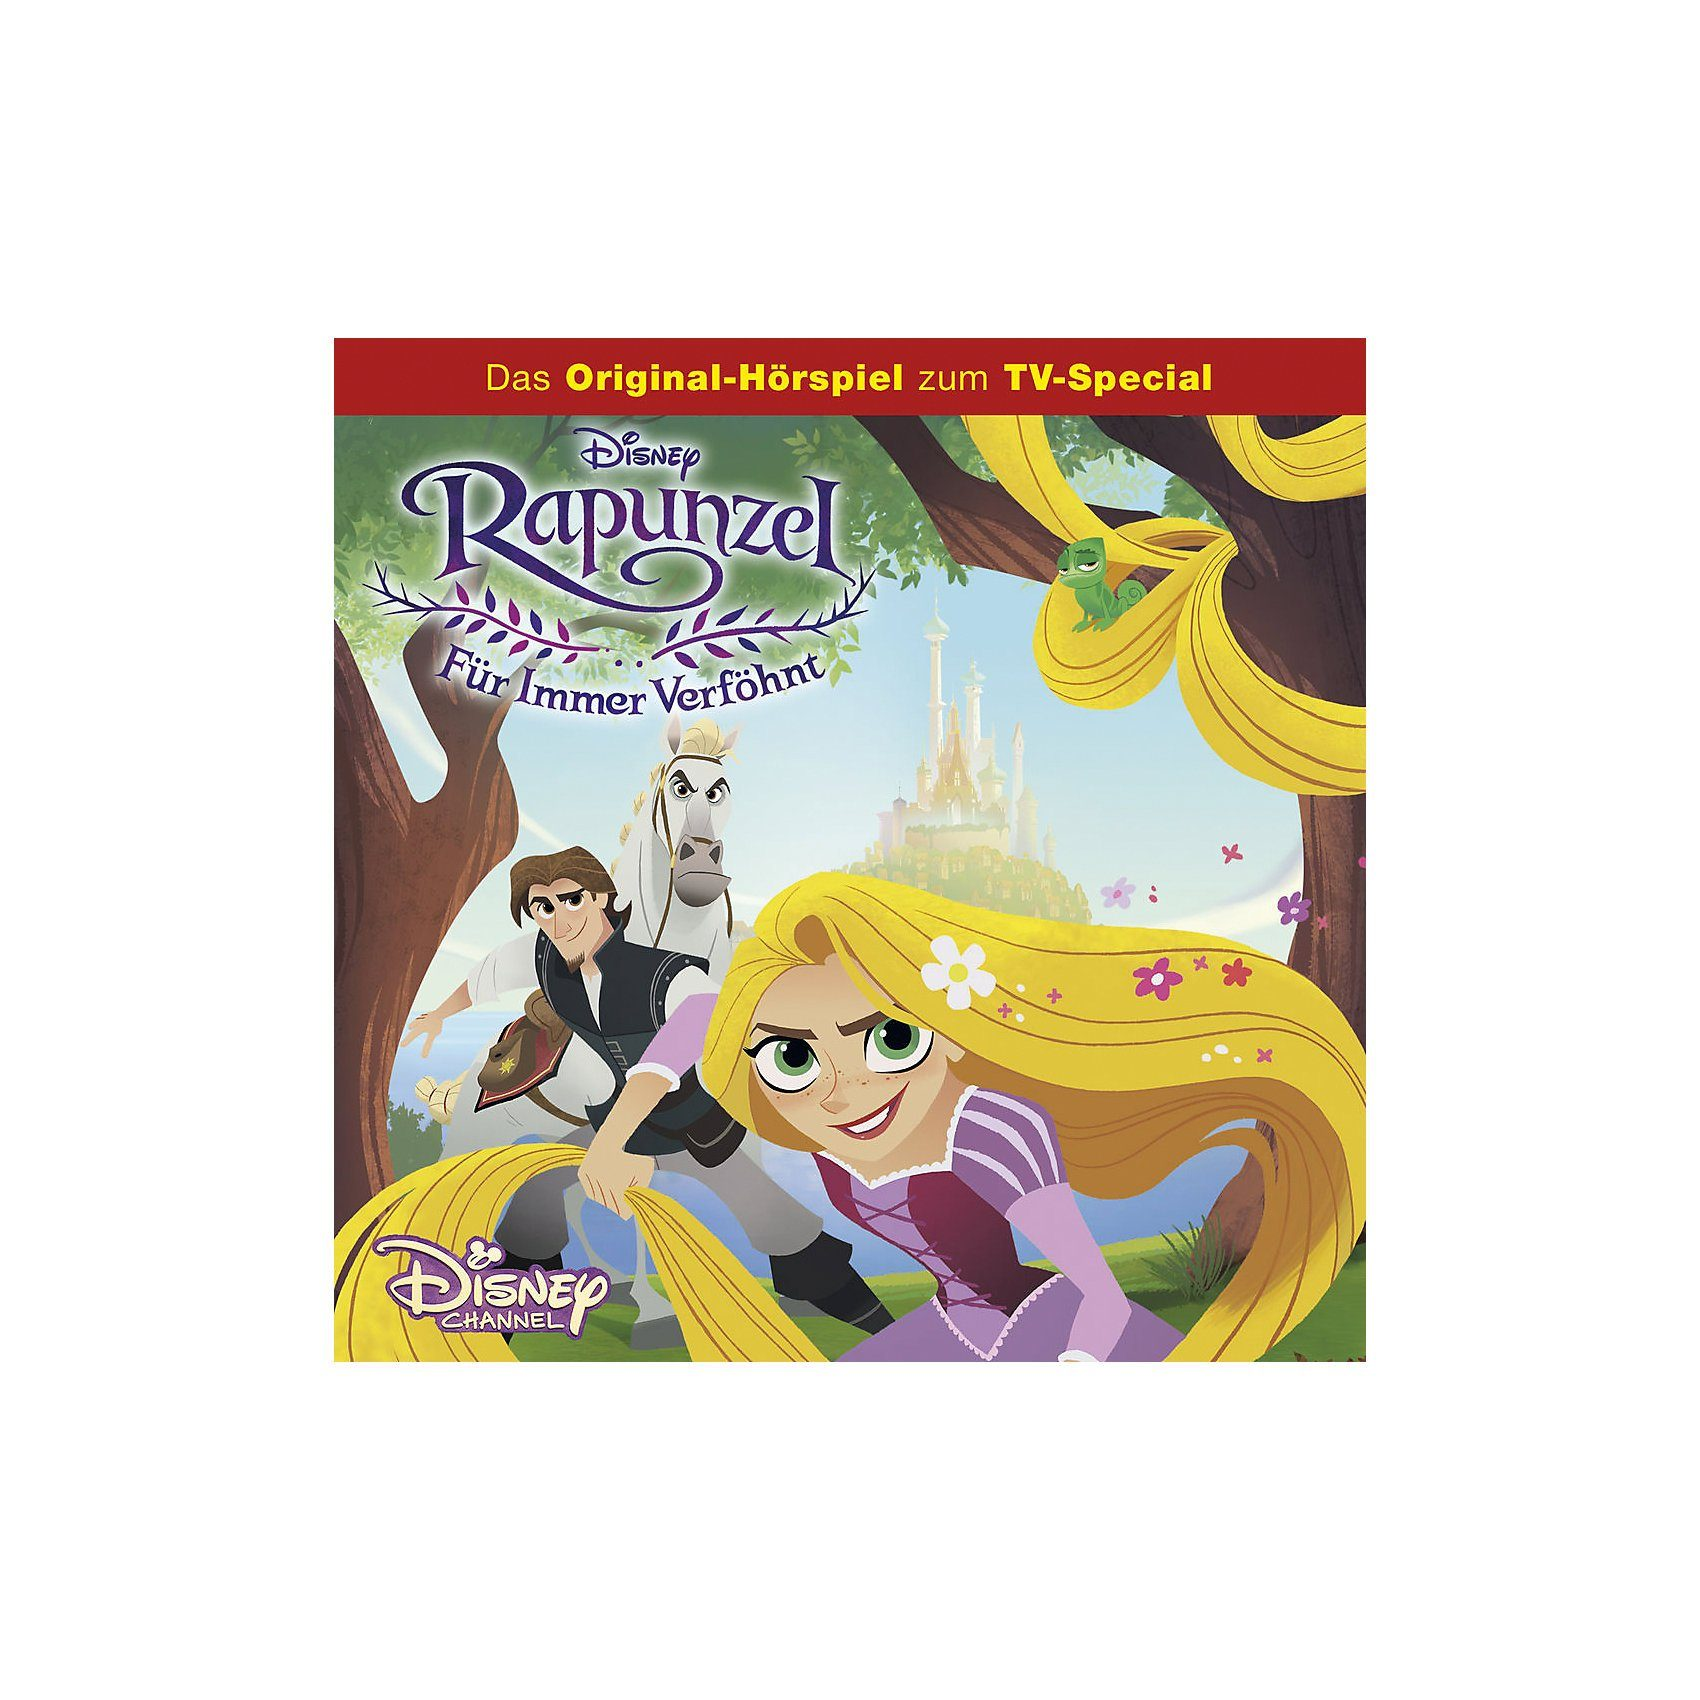 Kiddinx CD Disney Rapunzel - Pilotfolge